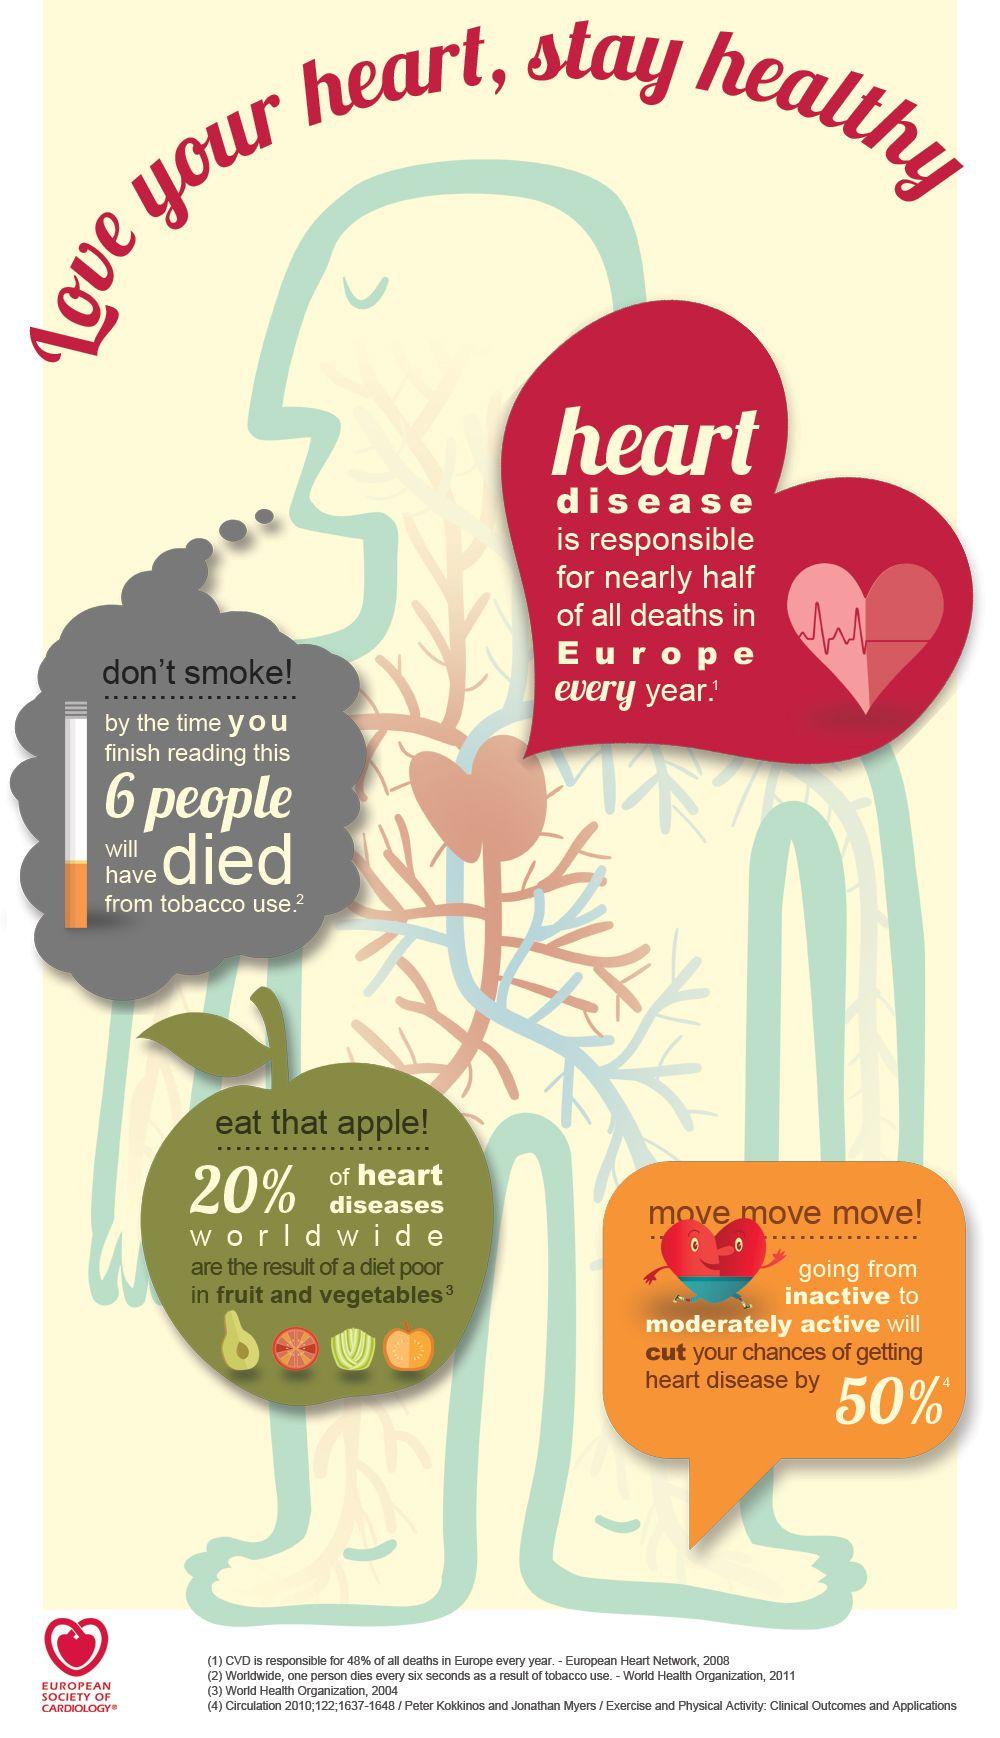 Health heart disease statistics infographic